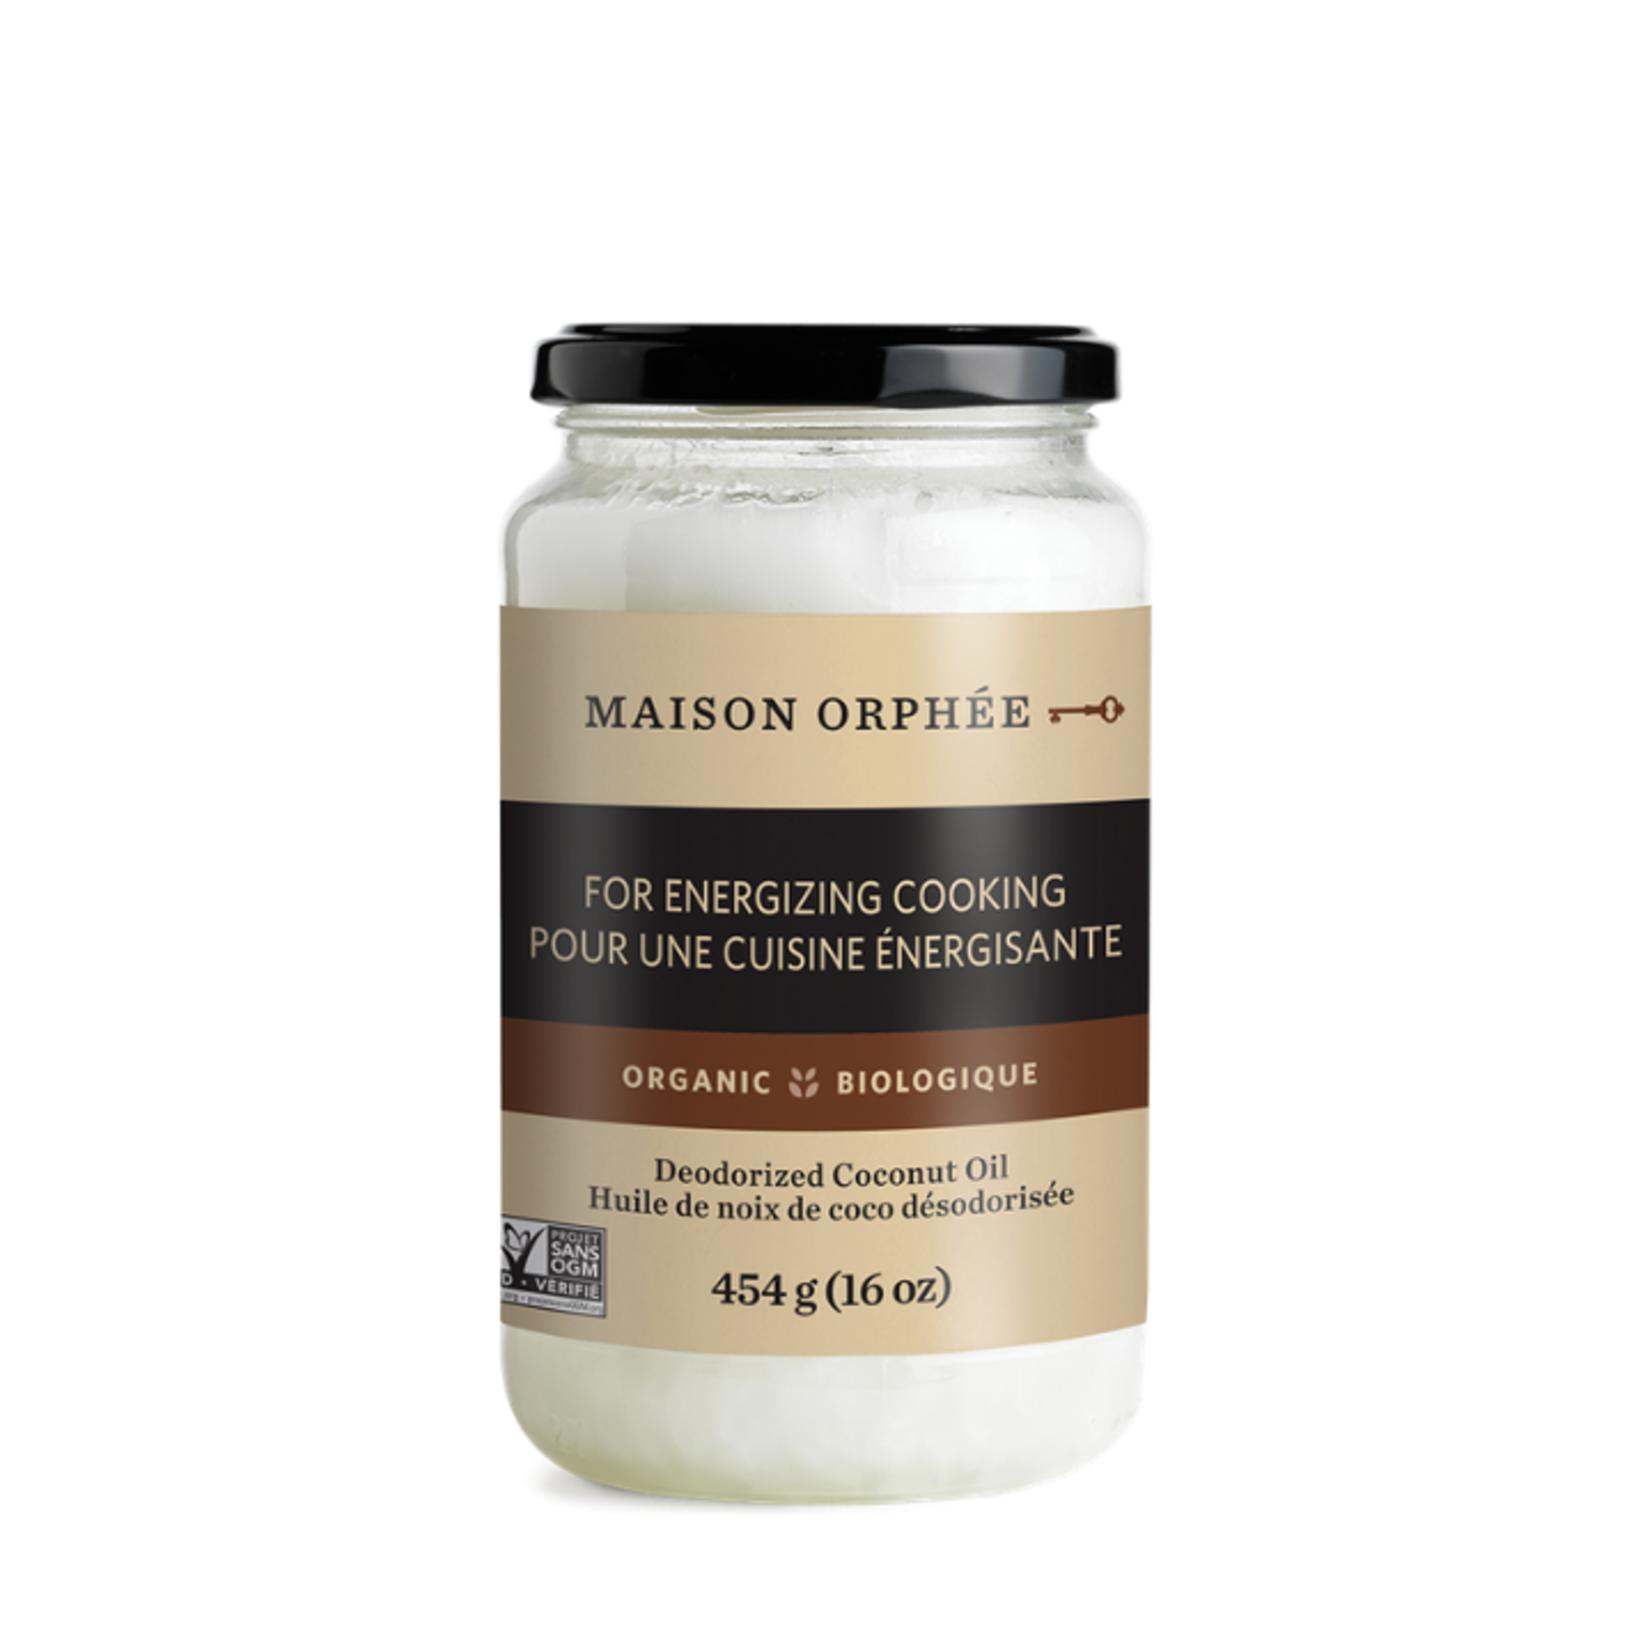 Maison Orphee Organic Coconut Oil Deodorized 454g